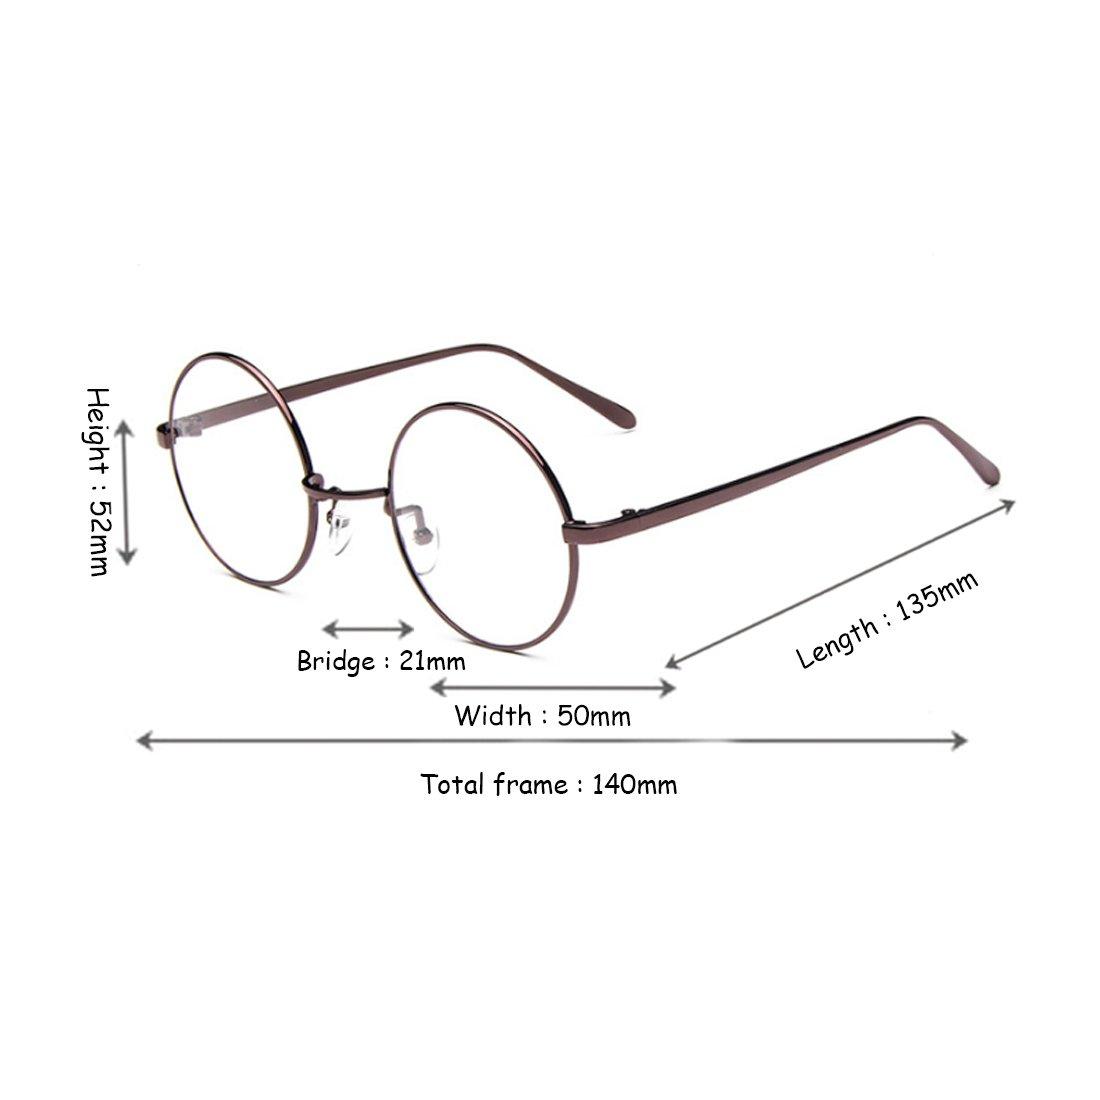 Fulision Male Female Circular myopia Glasses frame Fine Frame Retro Glasses by Fulision (Image #4)